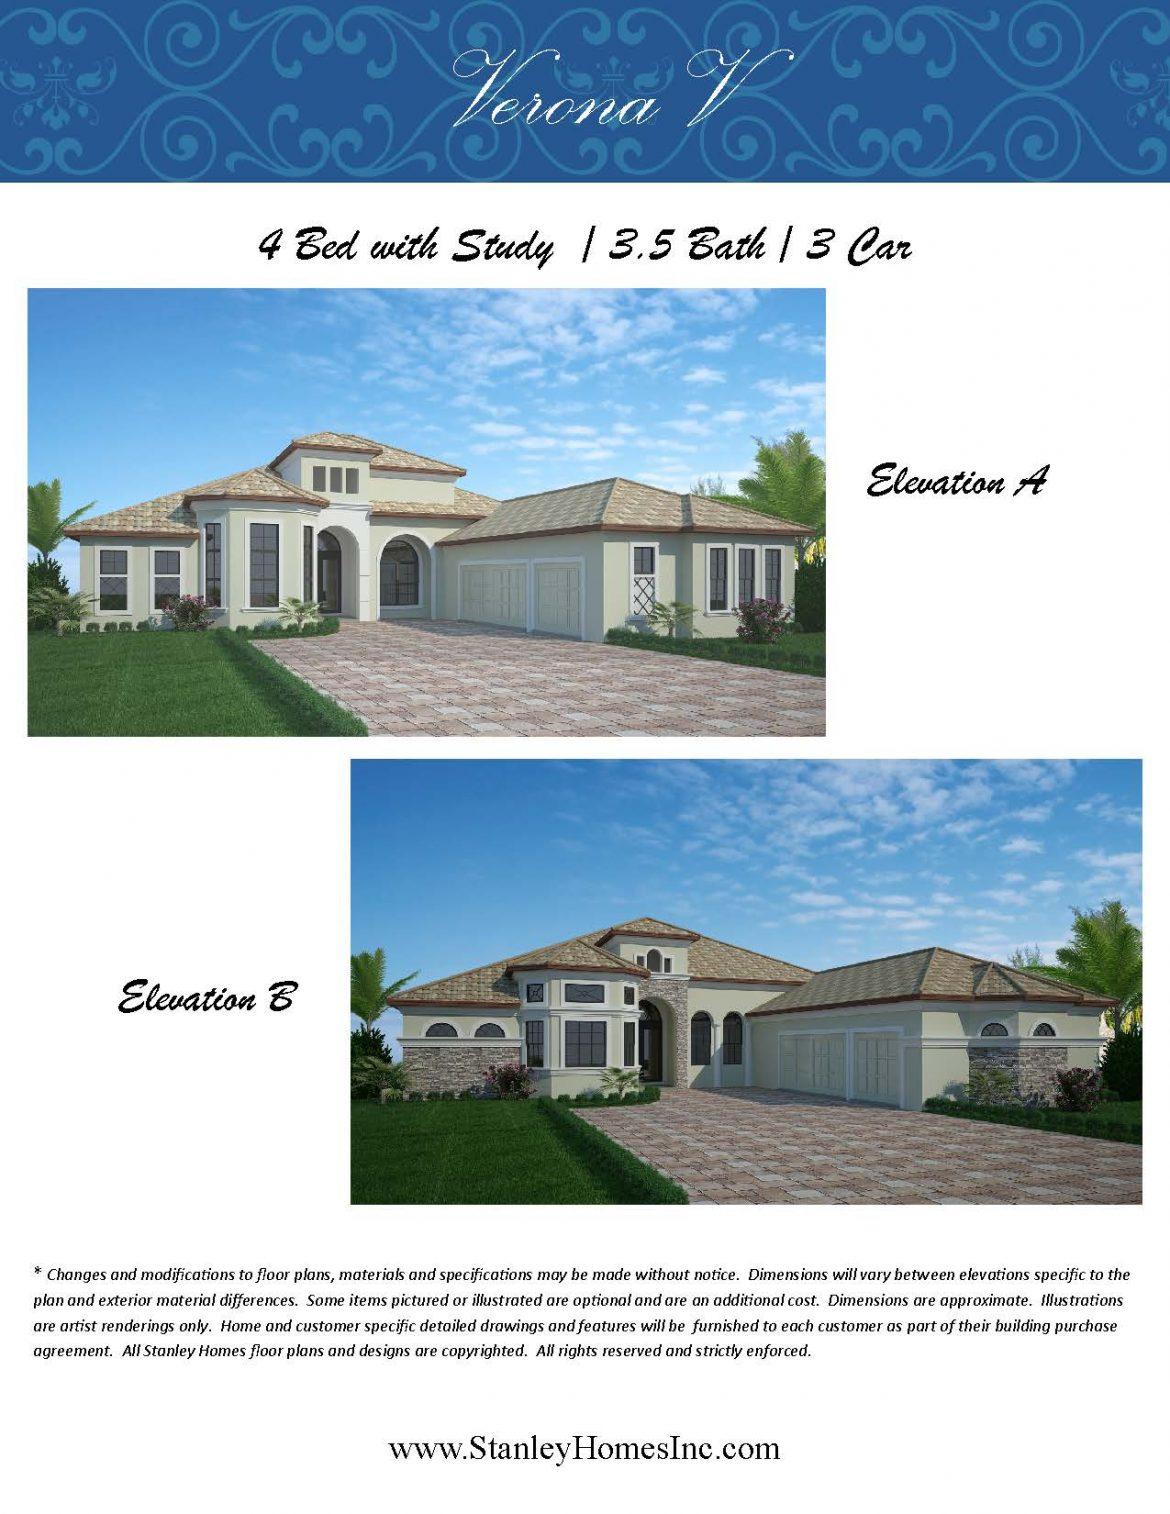 Stanley Homes Verona V Floor Plan Custom Homes in Viera FL Brevard